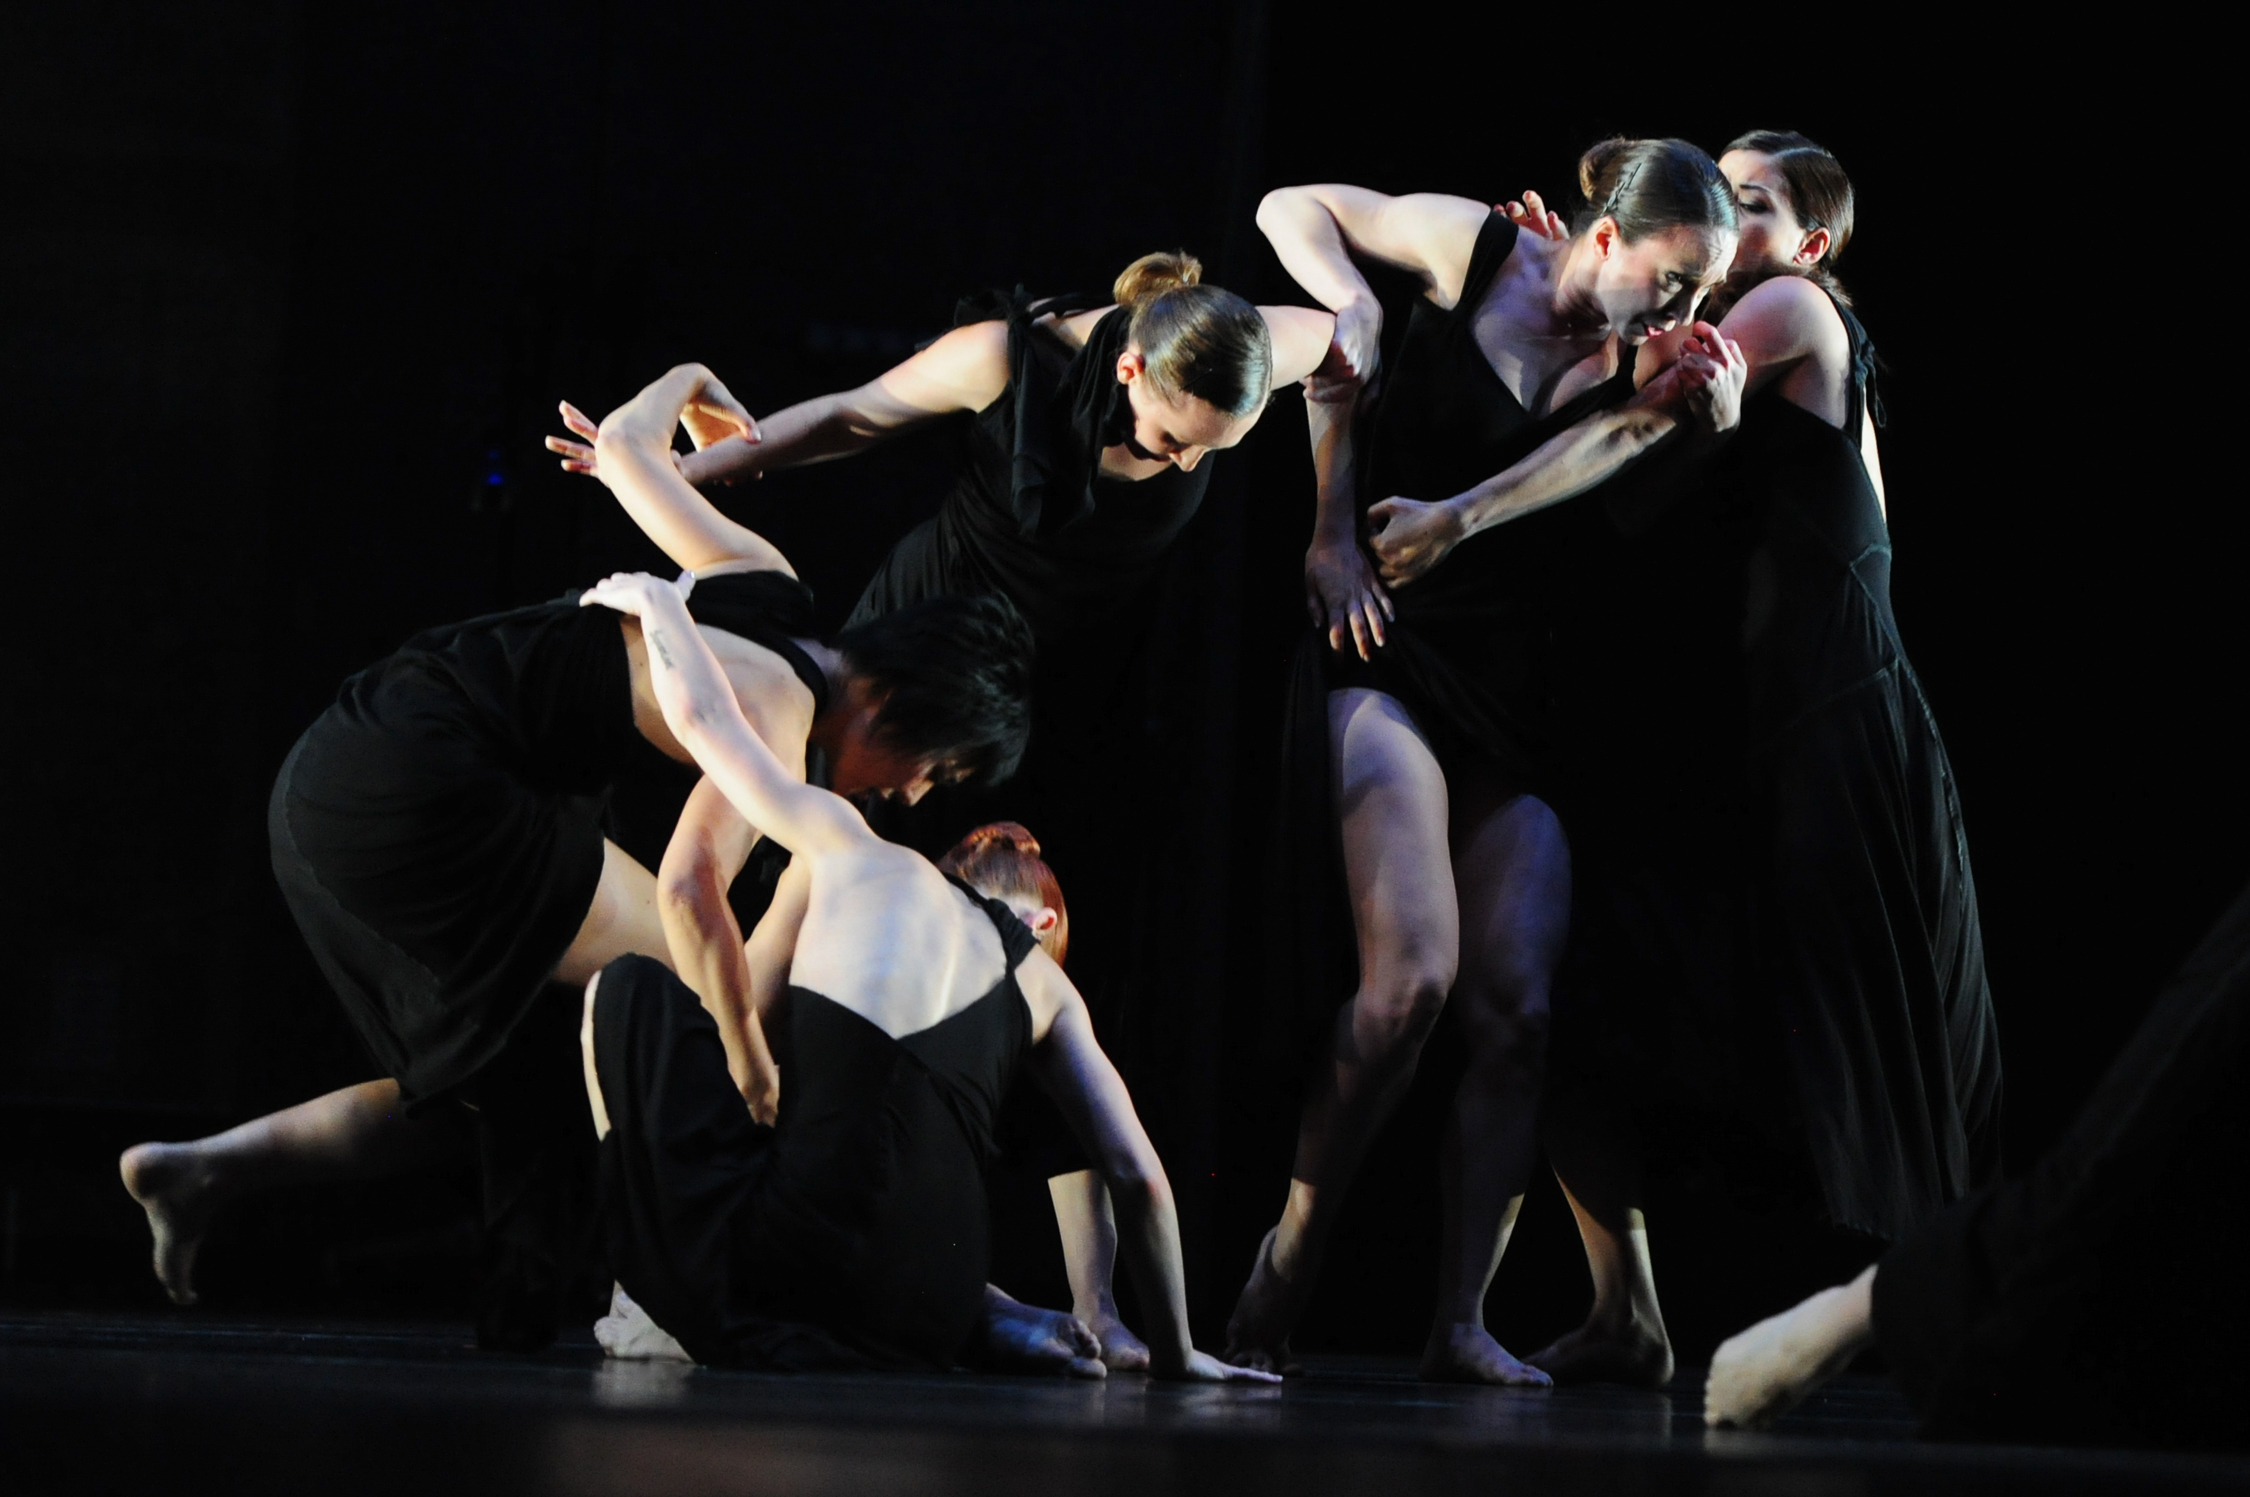 Backhausdance2017_BlackMorning_PhotobyJackHartin_5716.jpg